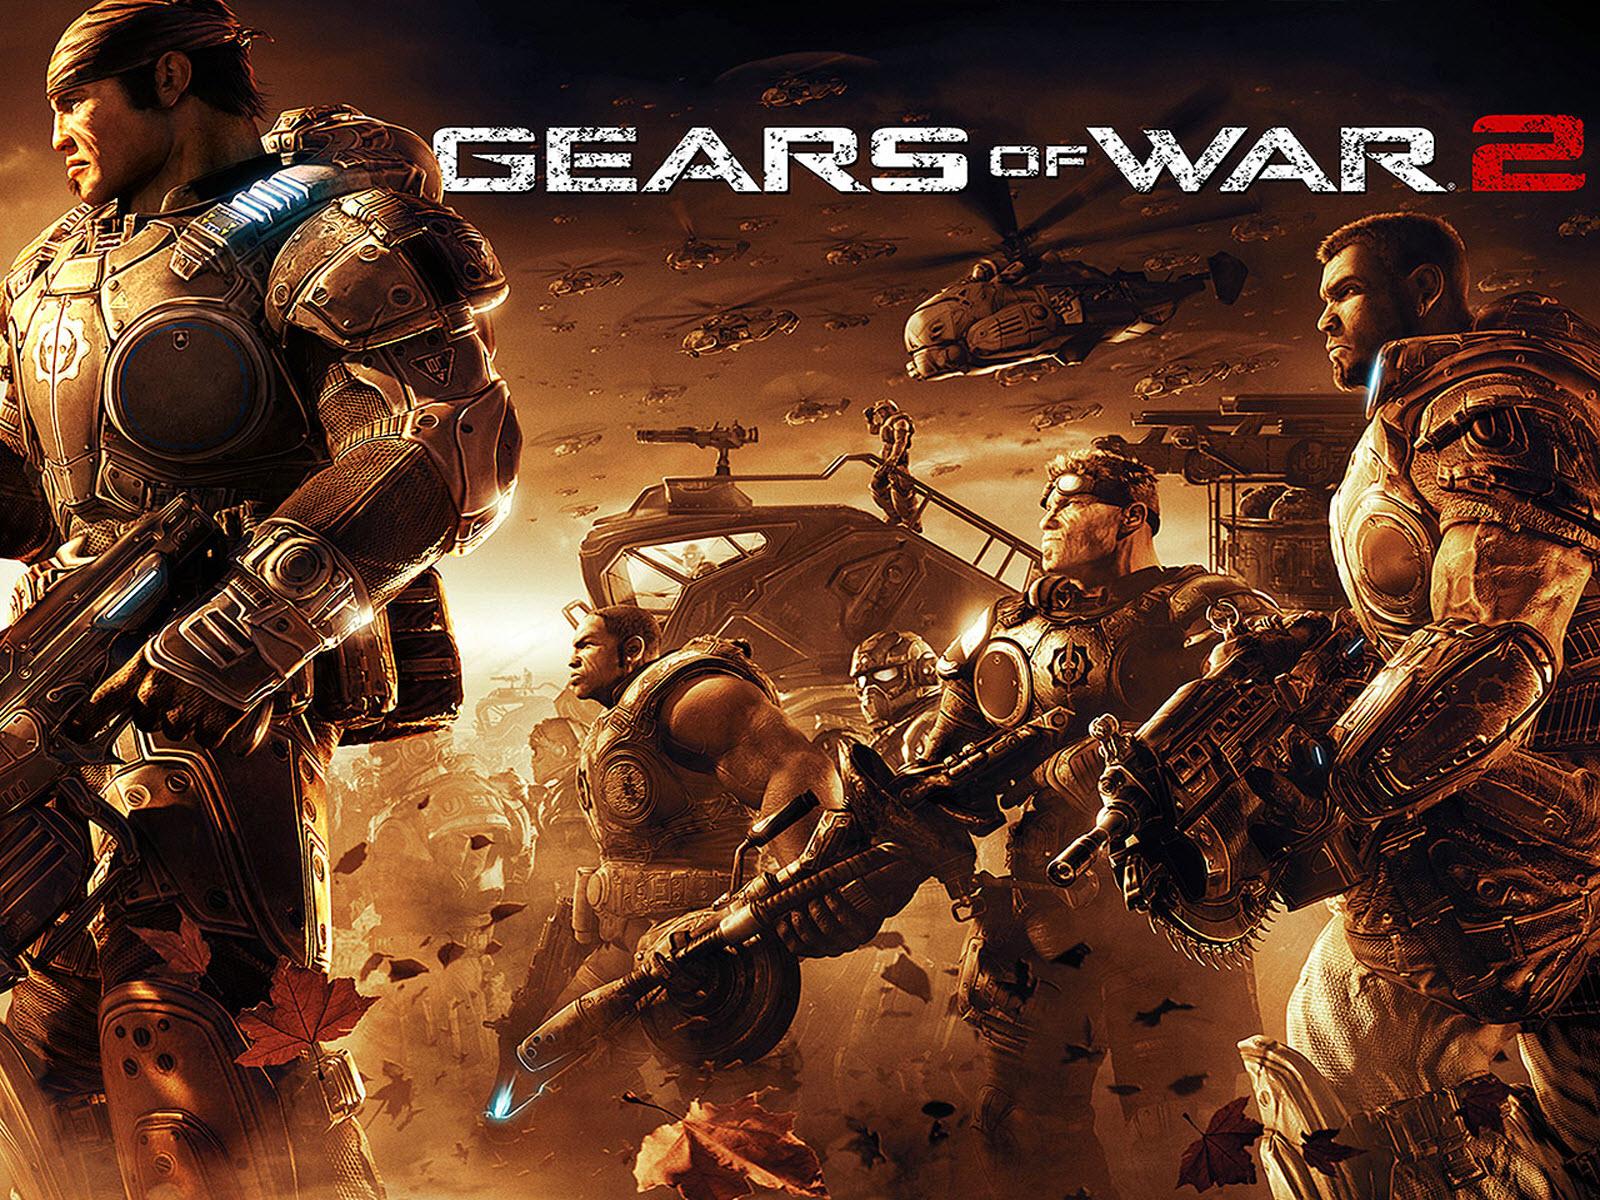 66 Gears Of War Hd Wallpaper On Wallpapersafari